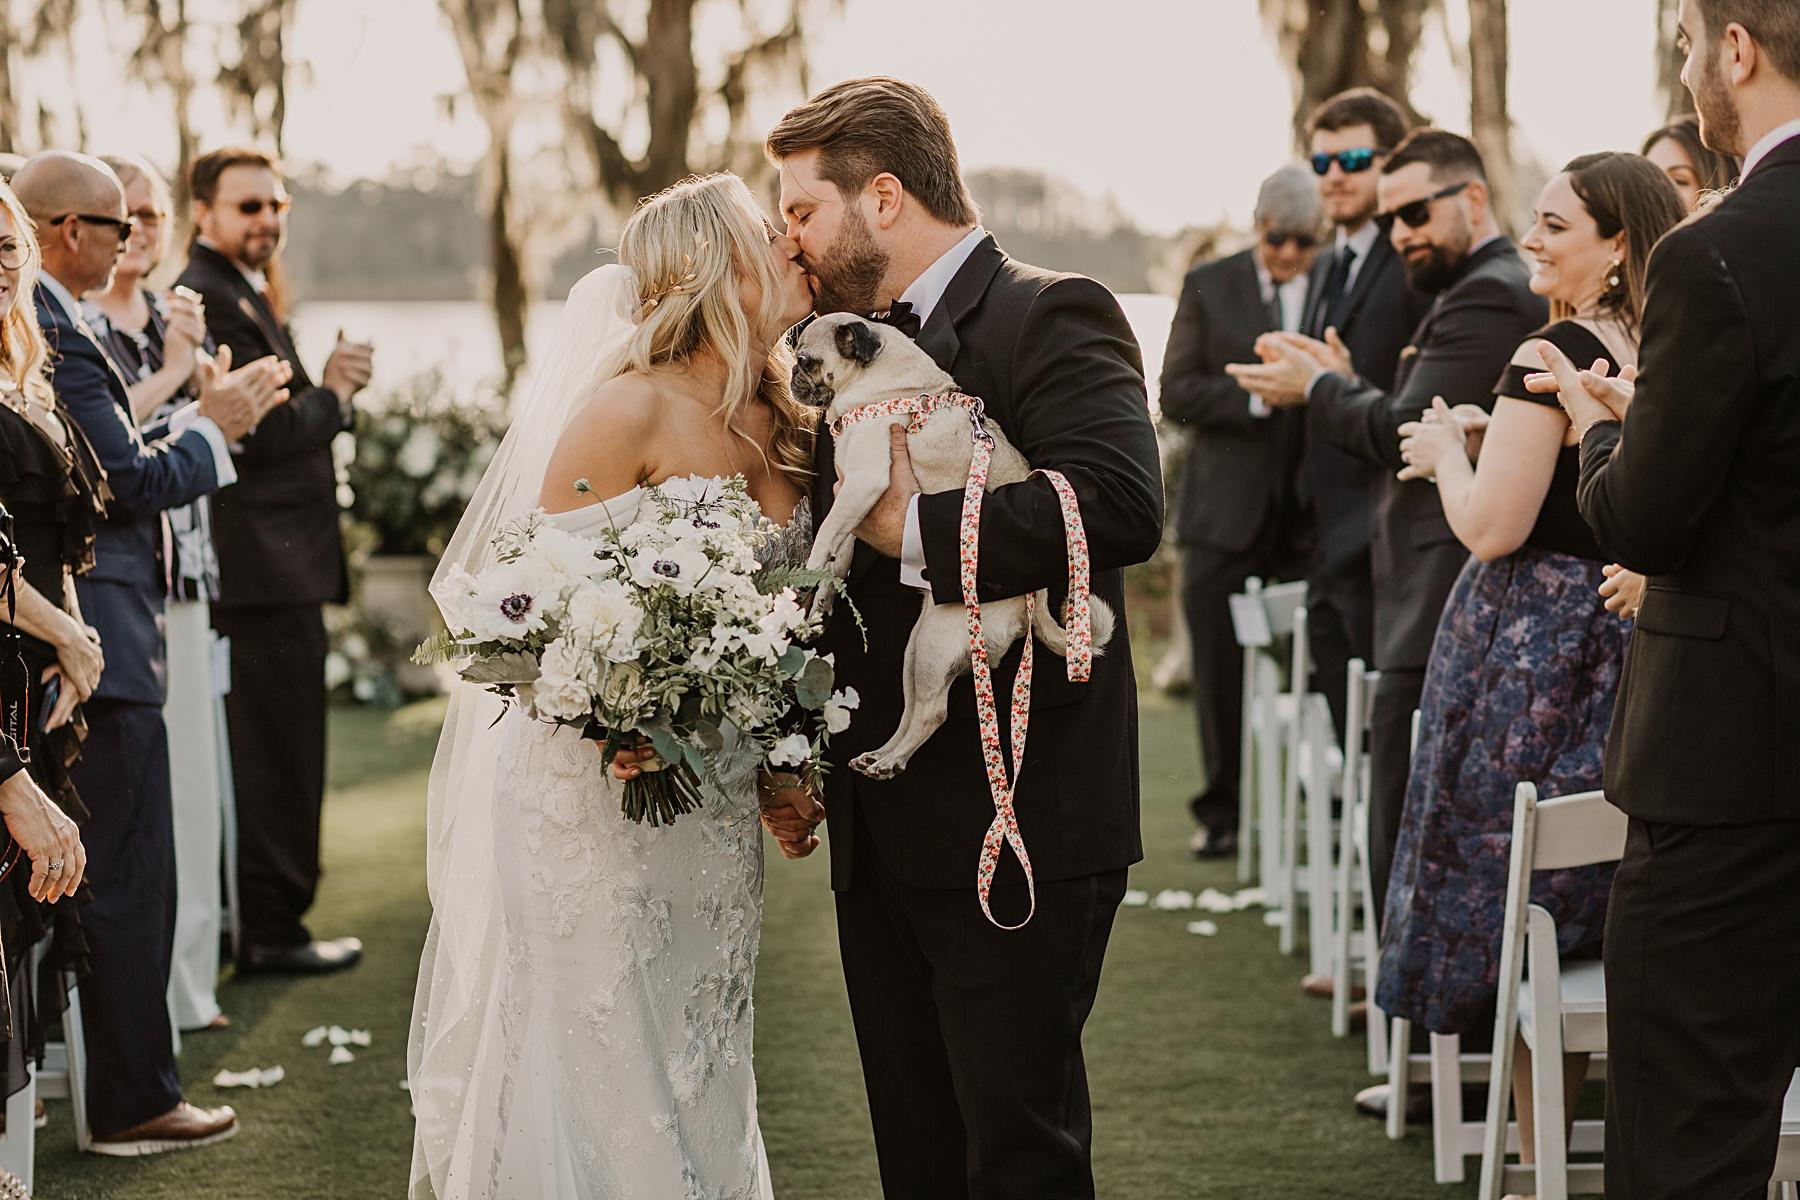 isleworth-wedding-29.jpg